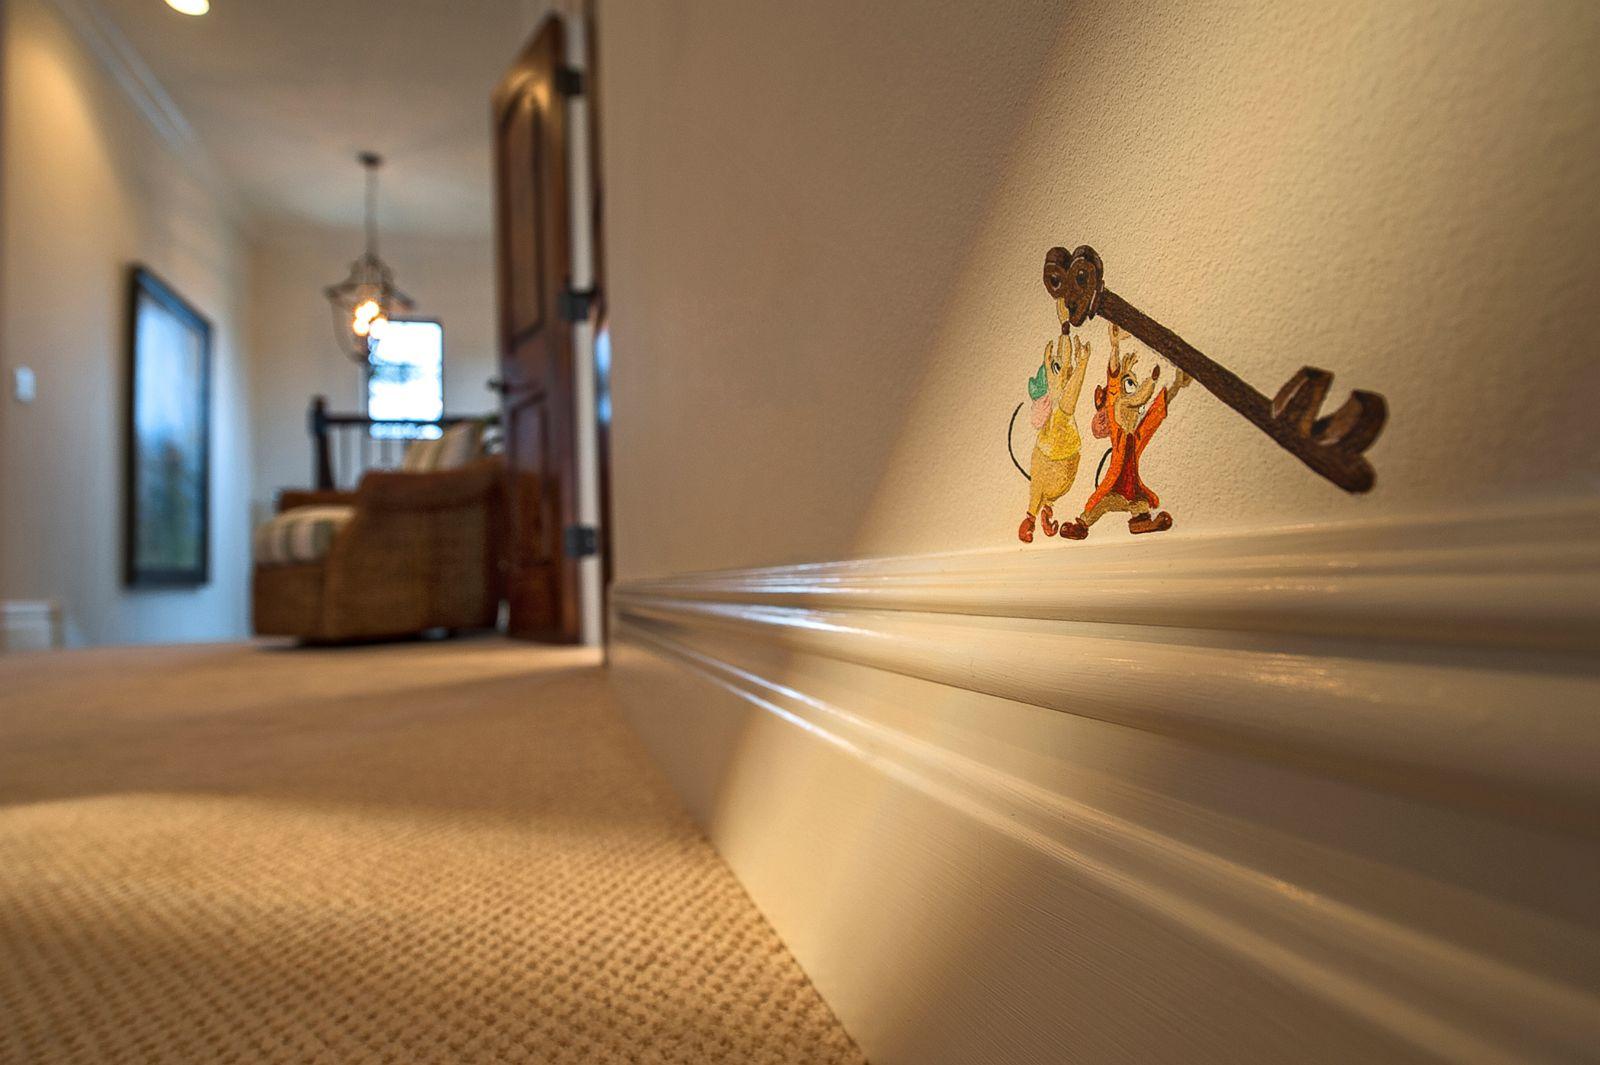 Inside walt disney world resorts first ever homes for sale photos image 5 abc news